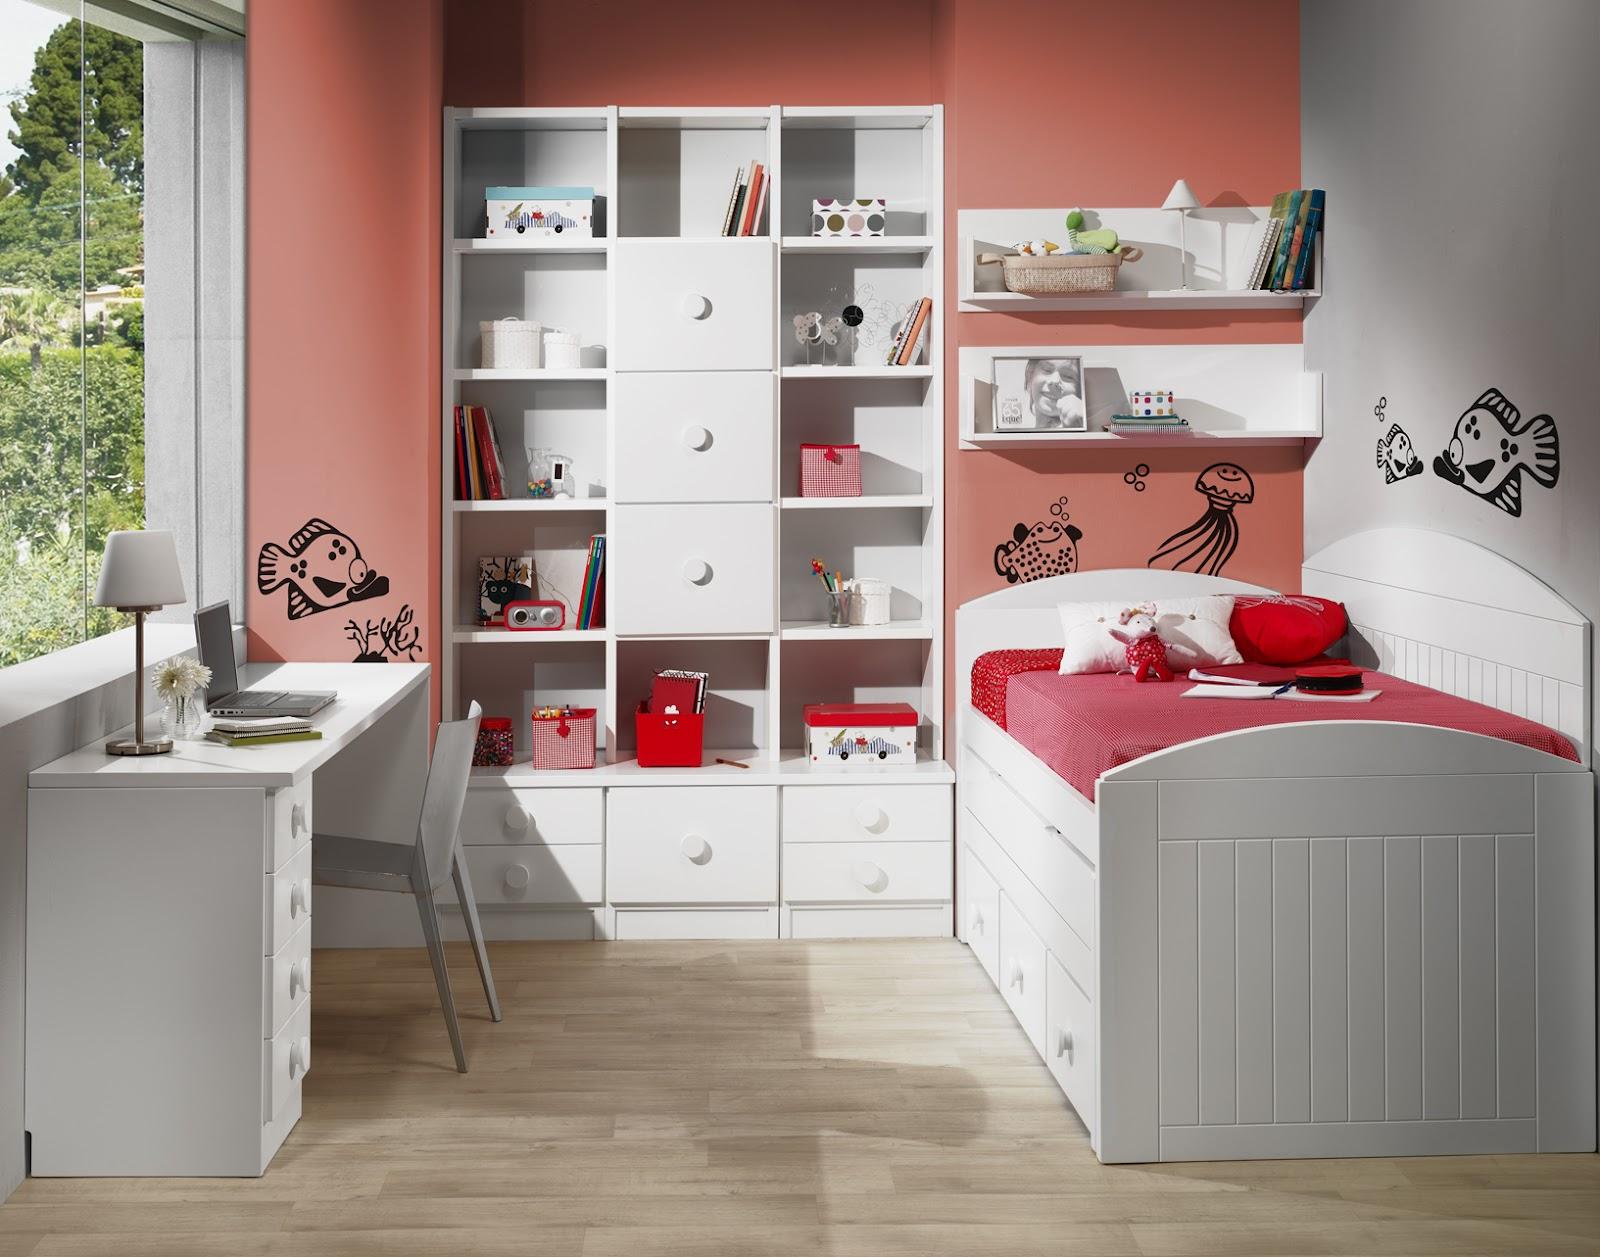 Dormitorios habitaciones juveniles e infantiles lacadas for Dormitorios juveniles para ninas